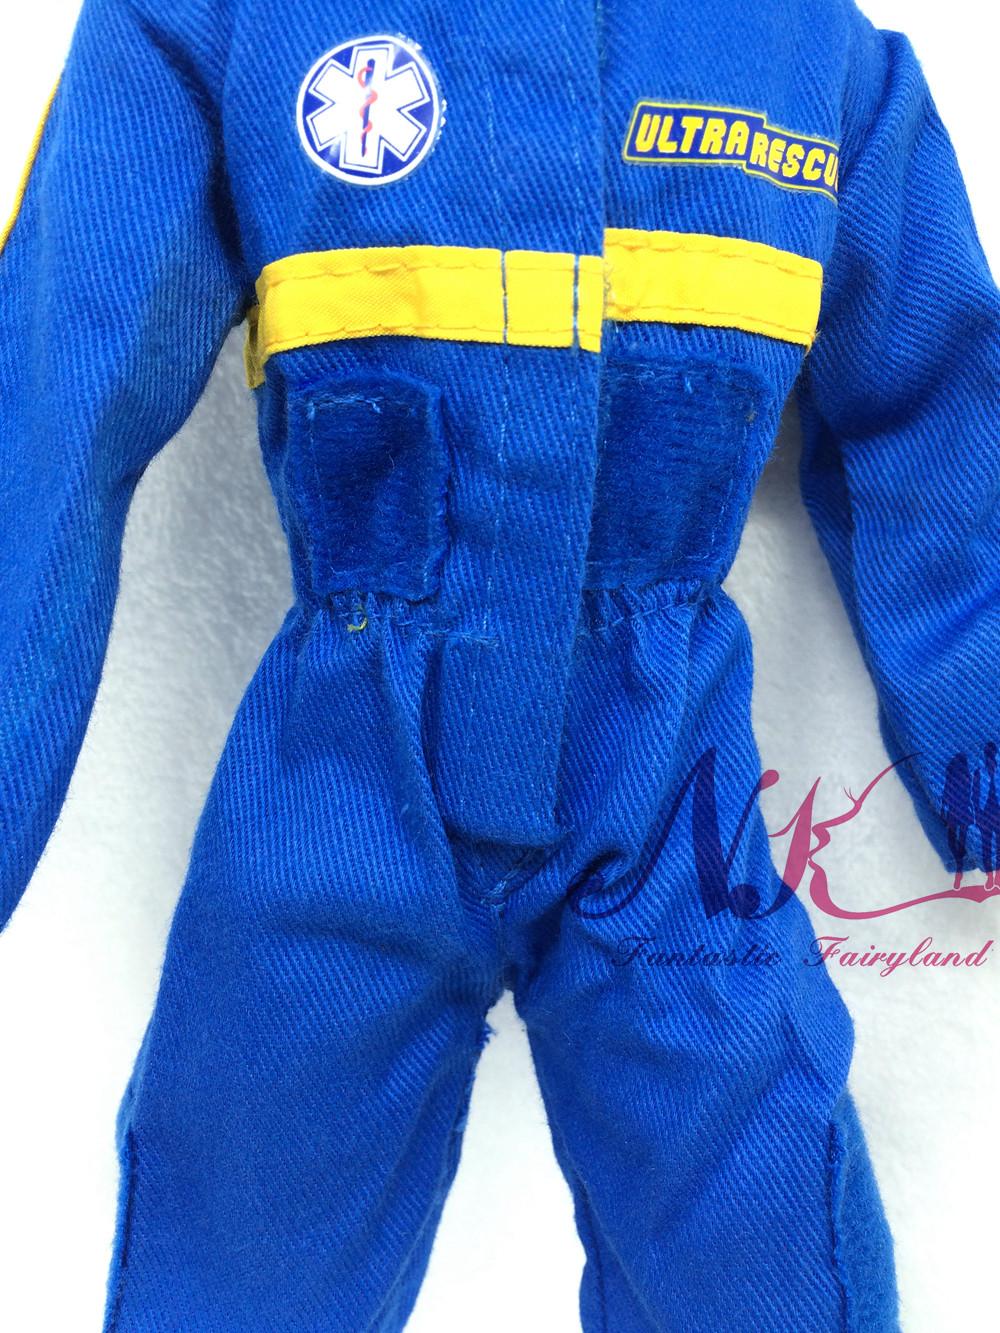 NK Unique Doll Prince Garments Fight Uniform Navy Blue Jumpsuits Outfit For Barbie Boy Male Ken Doll For Lanard  1/6 Soldier